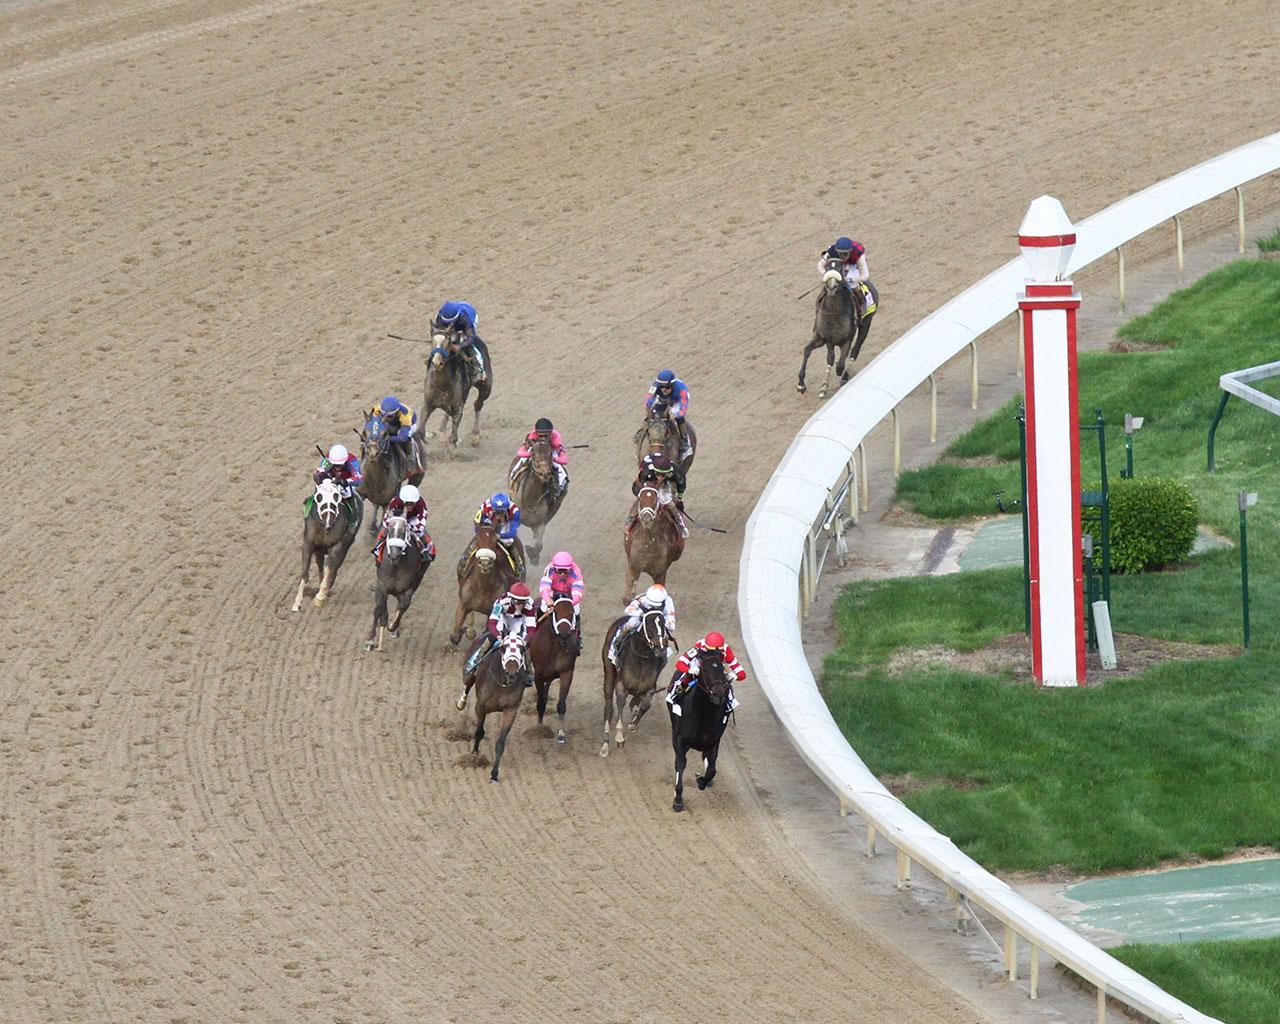 SERENGETI-EMPRESS---The-Longines-Kentucky-Oaks---145th-Running---05-03-19---R11---CD---Aerial-Turn-01